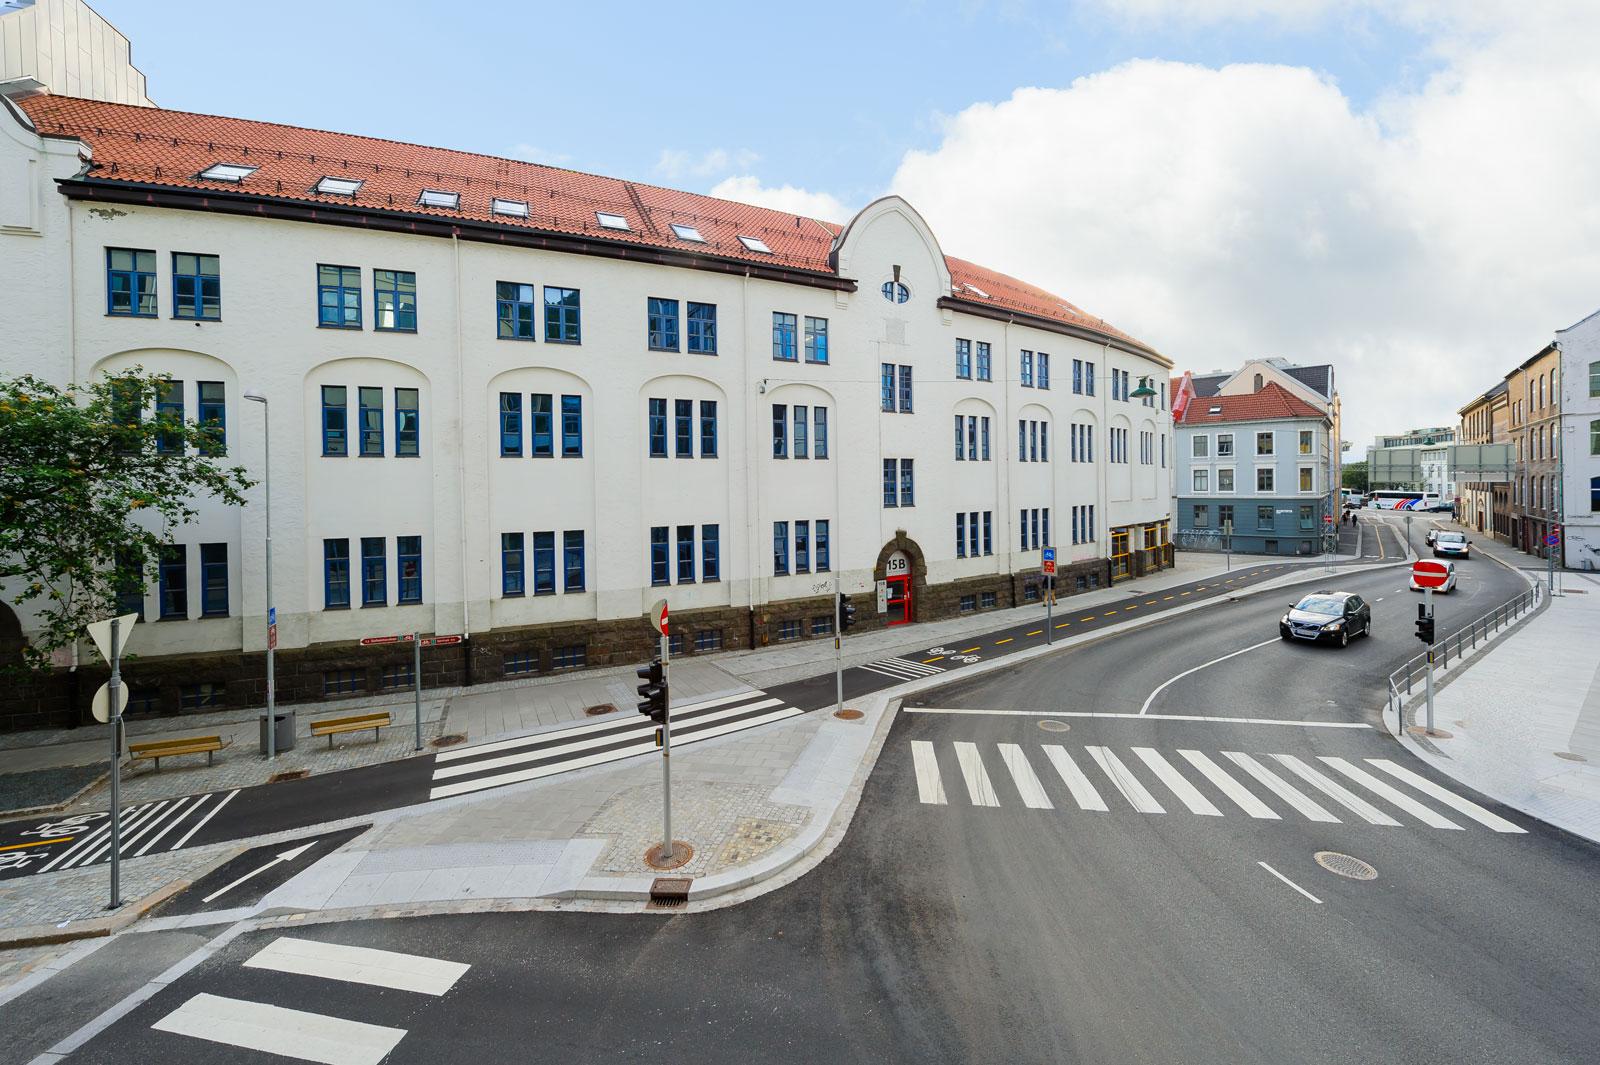 Odfjell Eiendom | LARS HILLESGATE 15 1